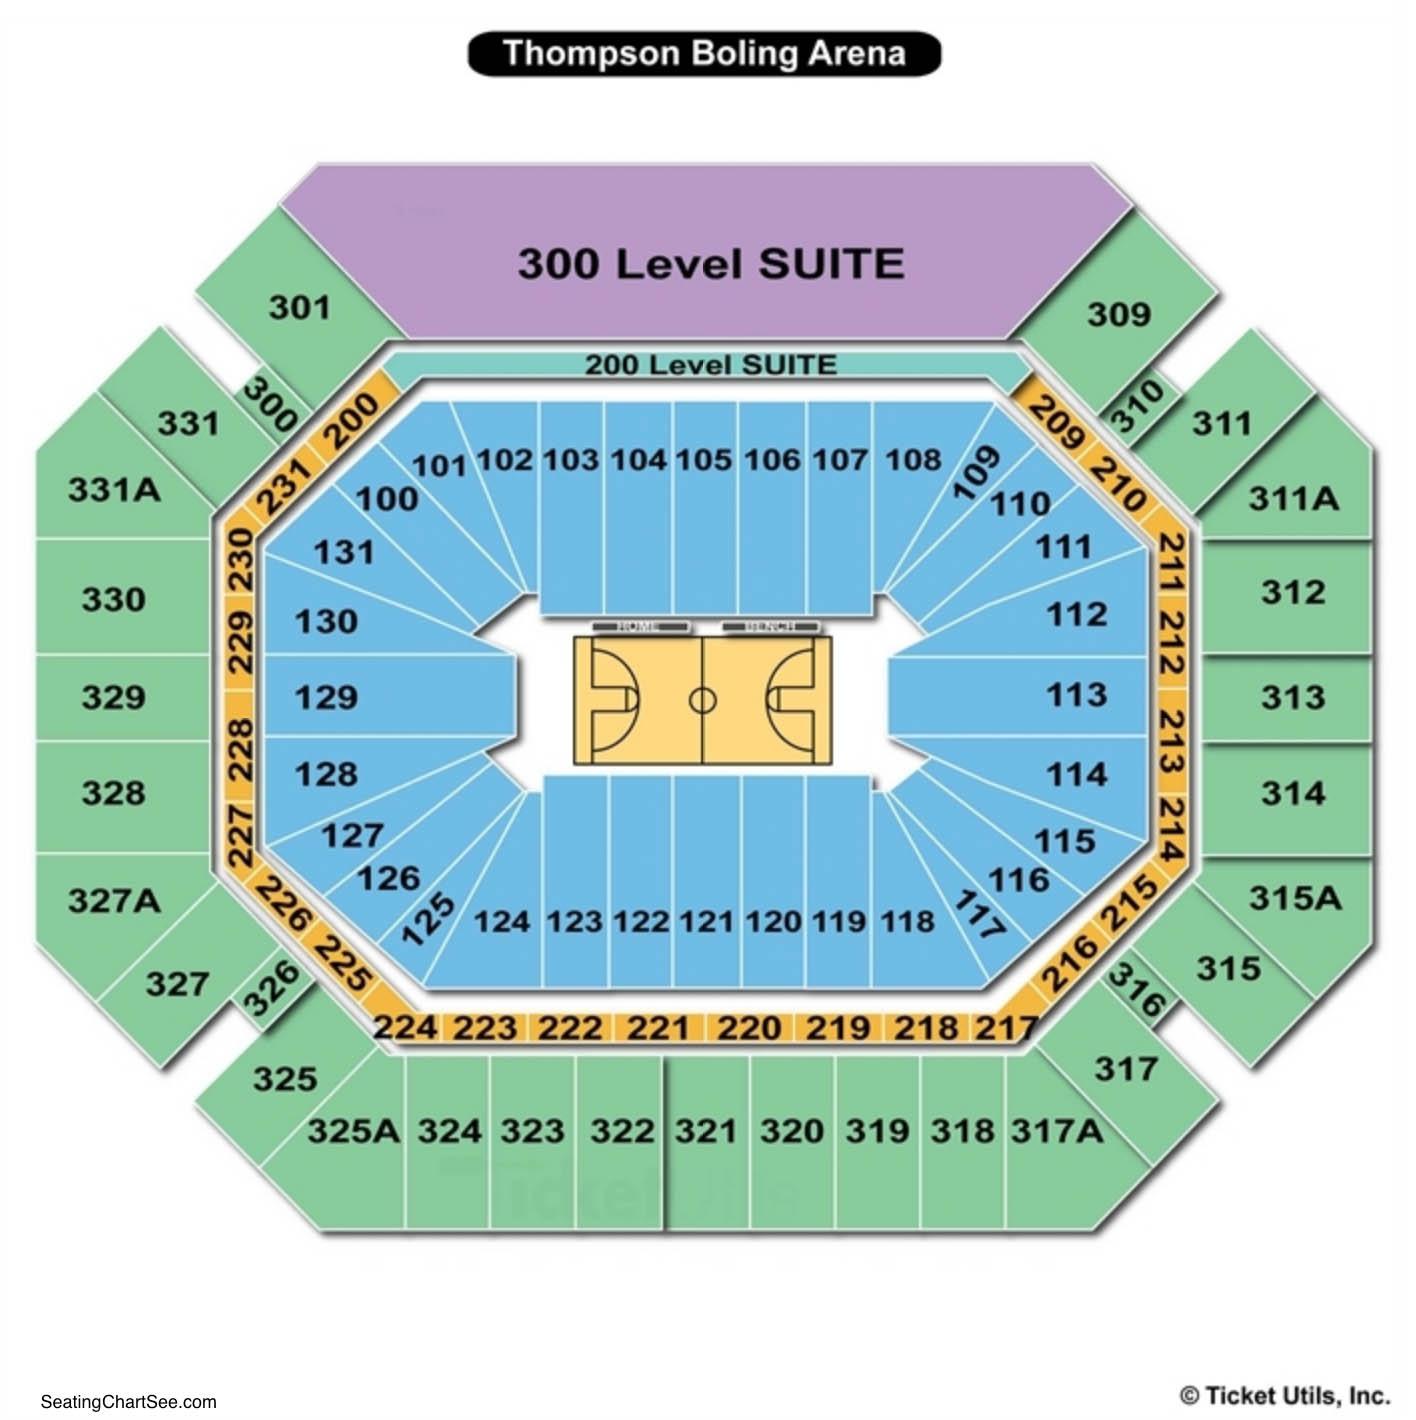 Thompson Boling Arena Basketball Seating Chart